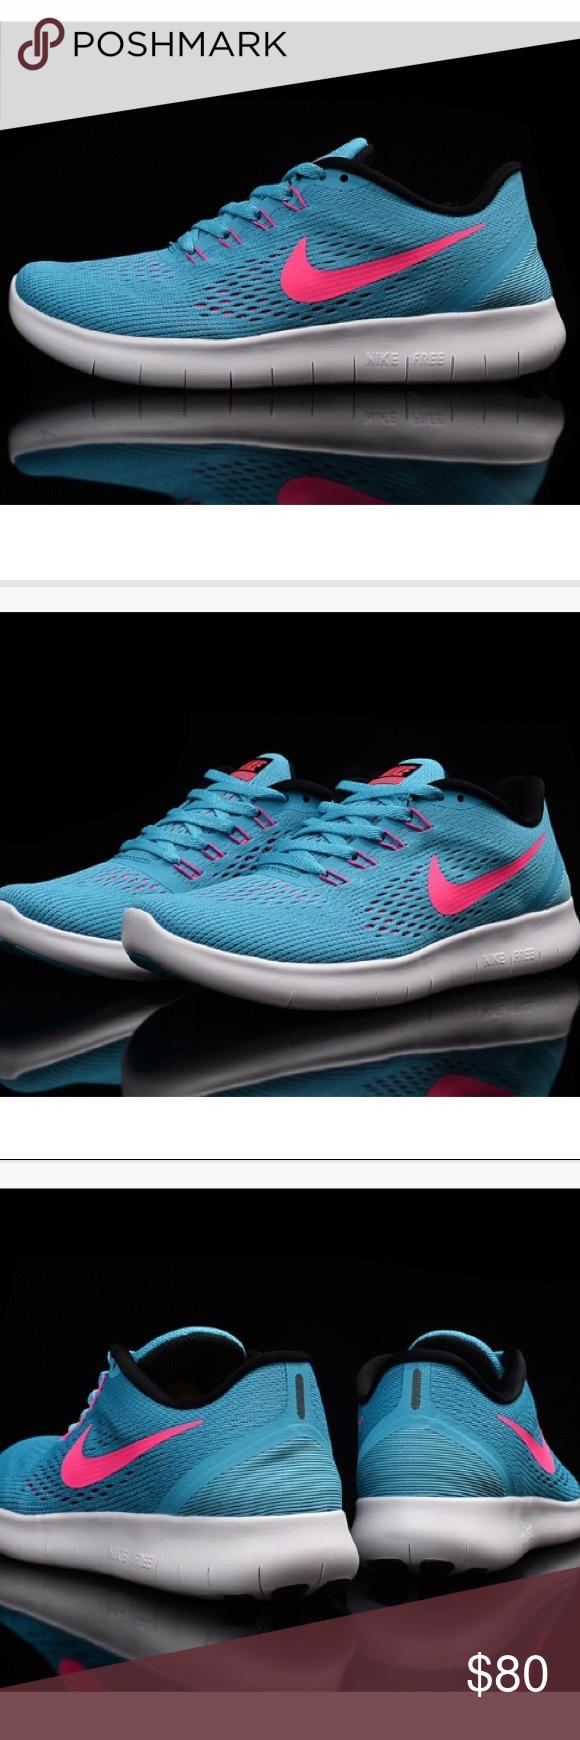 1d6c2843cffc9 Womens Nike Free Rn Womens Nike Free Rn Running Shoe Gamma-blue pink blast  Style Code 831509 401 Nike Shoes Sneakers